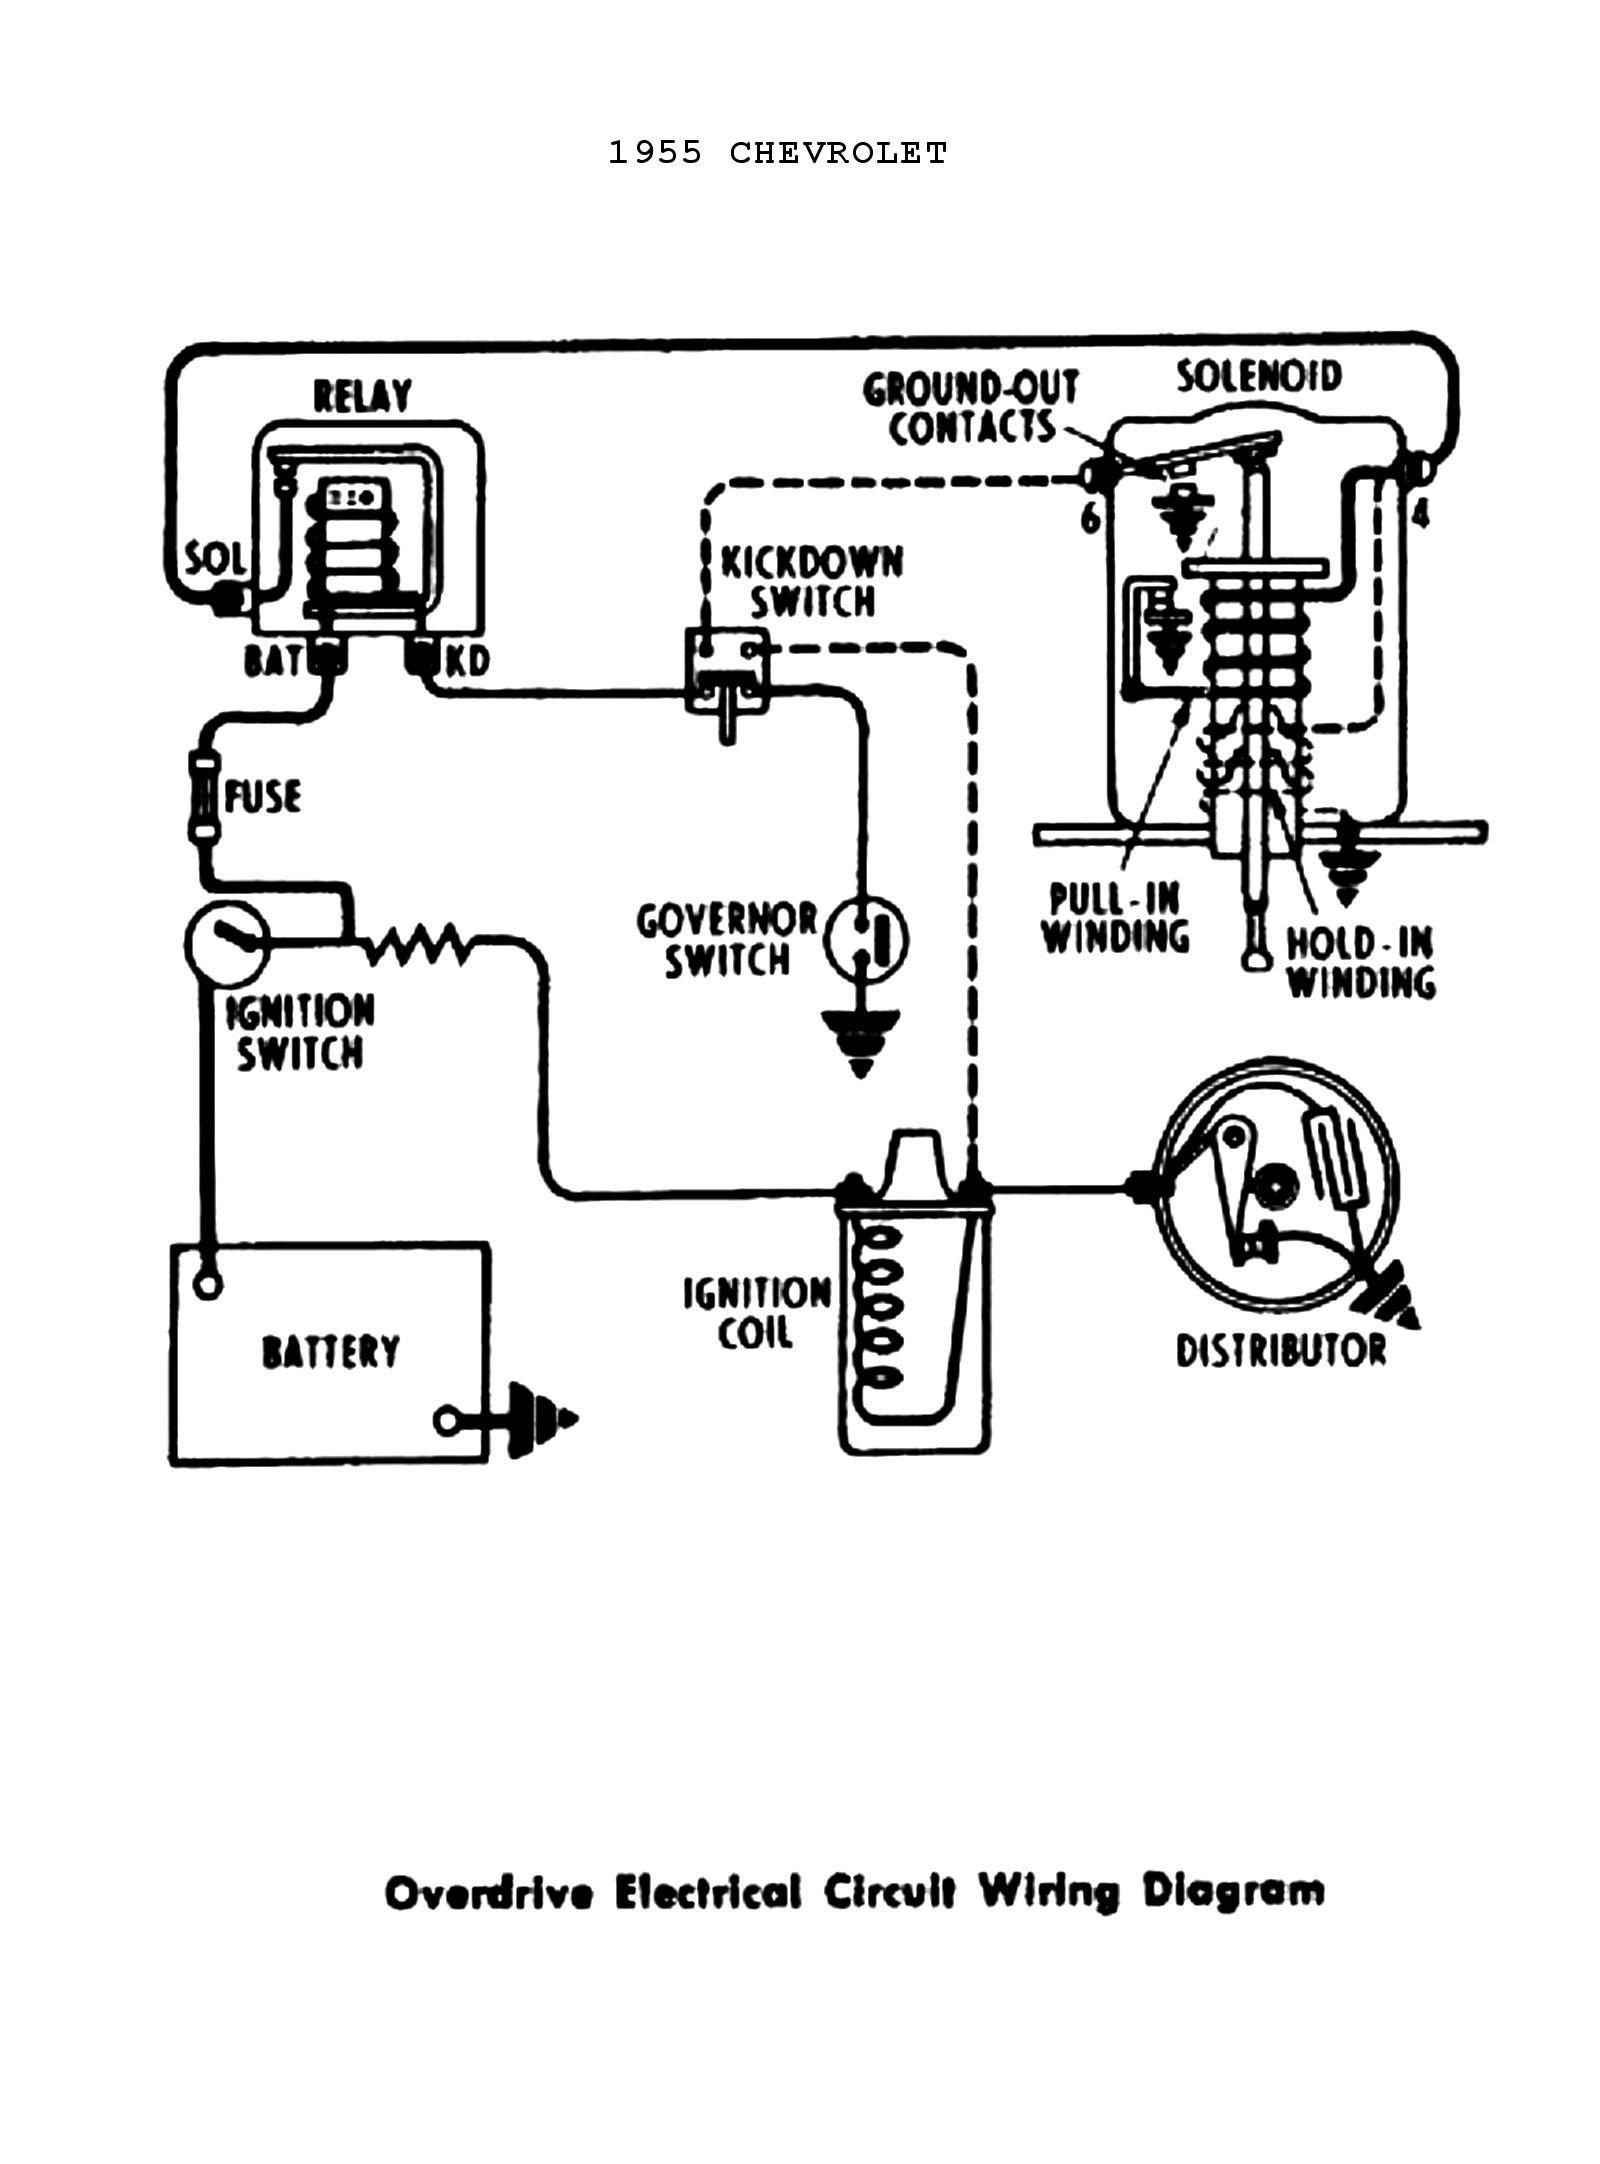 1951 Chevy Truck Wiring Diagram Chevy Wiring Diagrams Of 1951 Chevy Truck Wiring Diagram